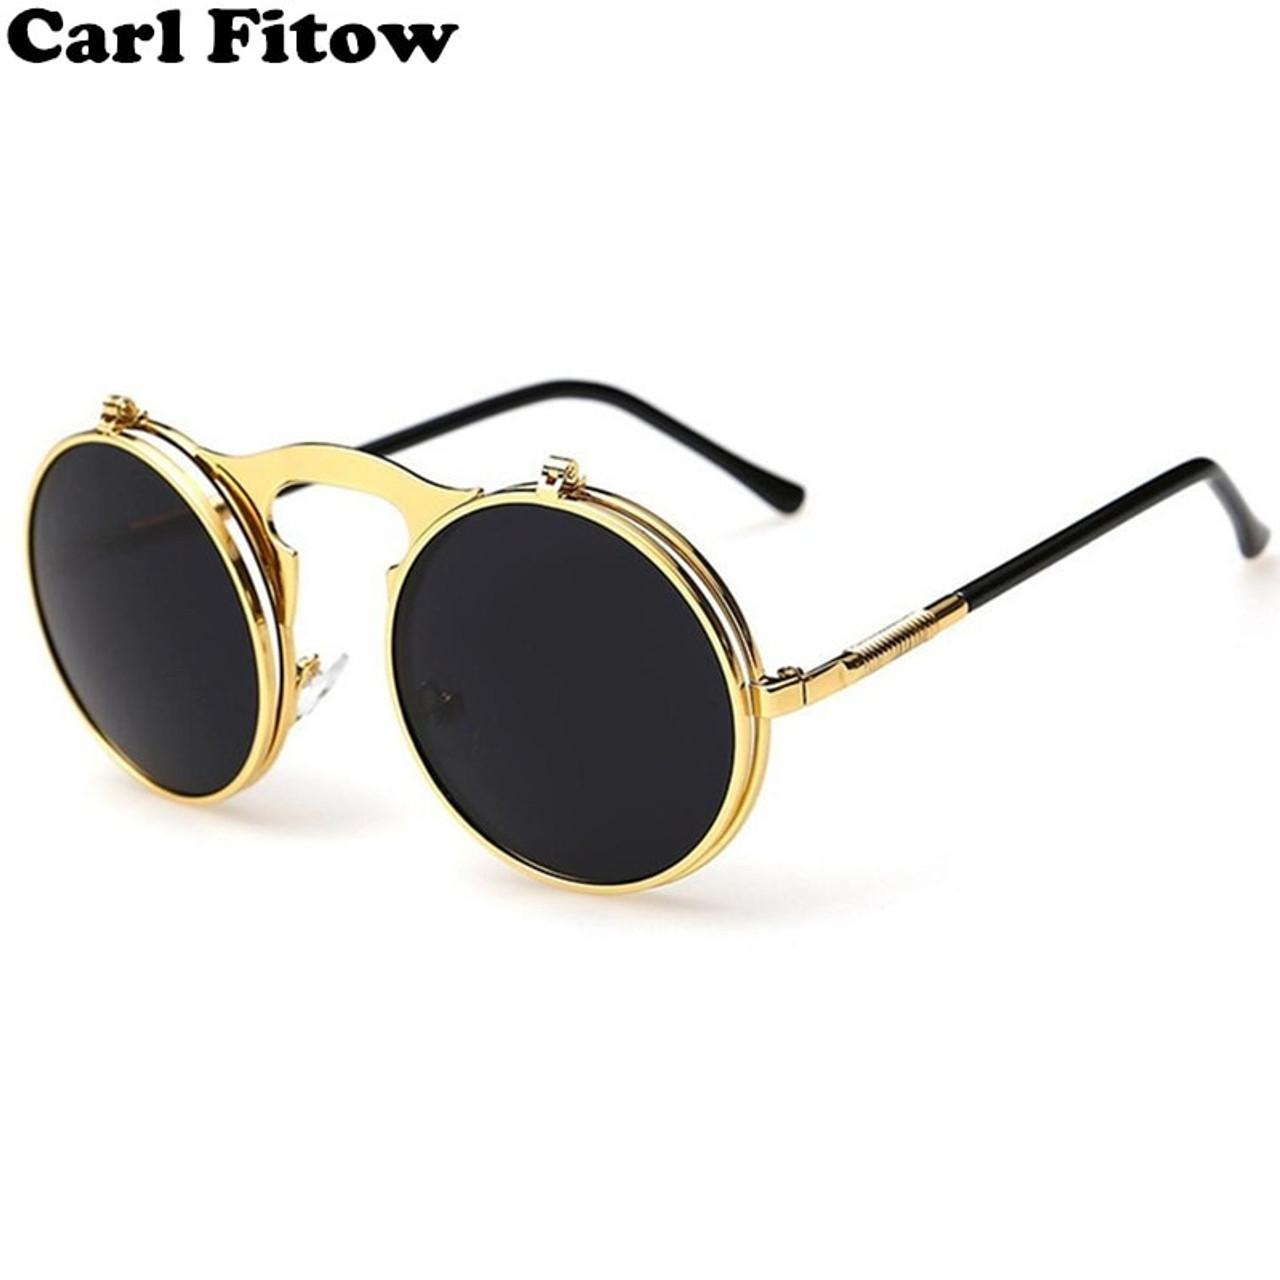 aa85719461 men vintage round steampunk sunglasses men small round flip up sunglasses  women retro metal silver cheap ...